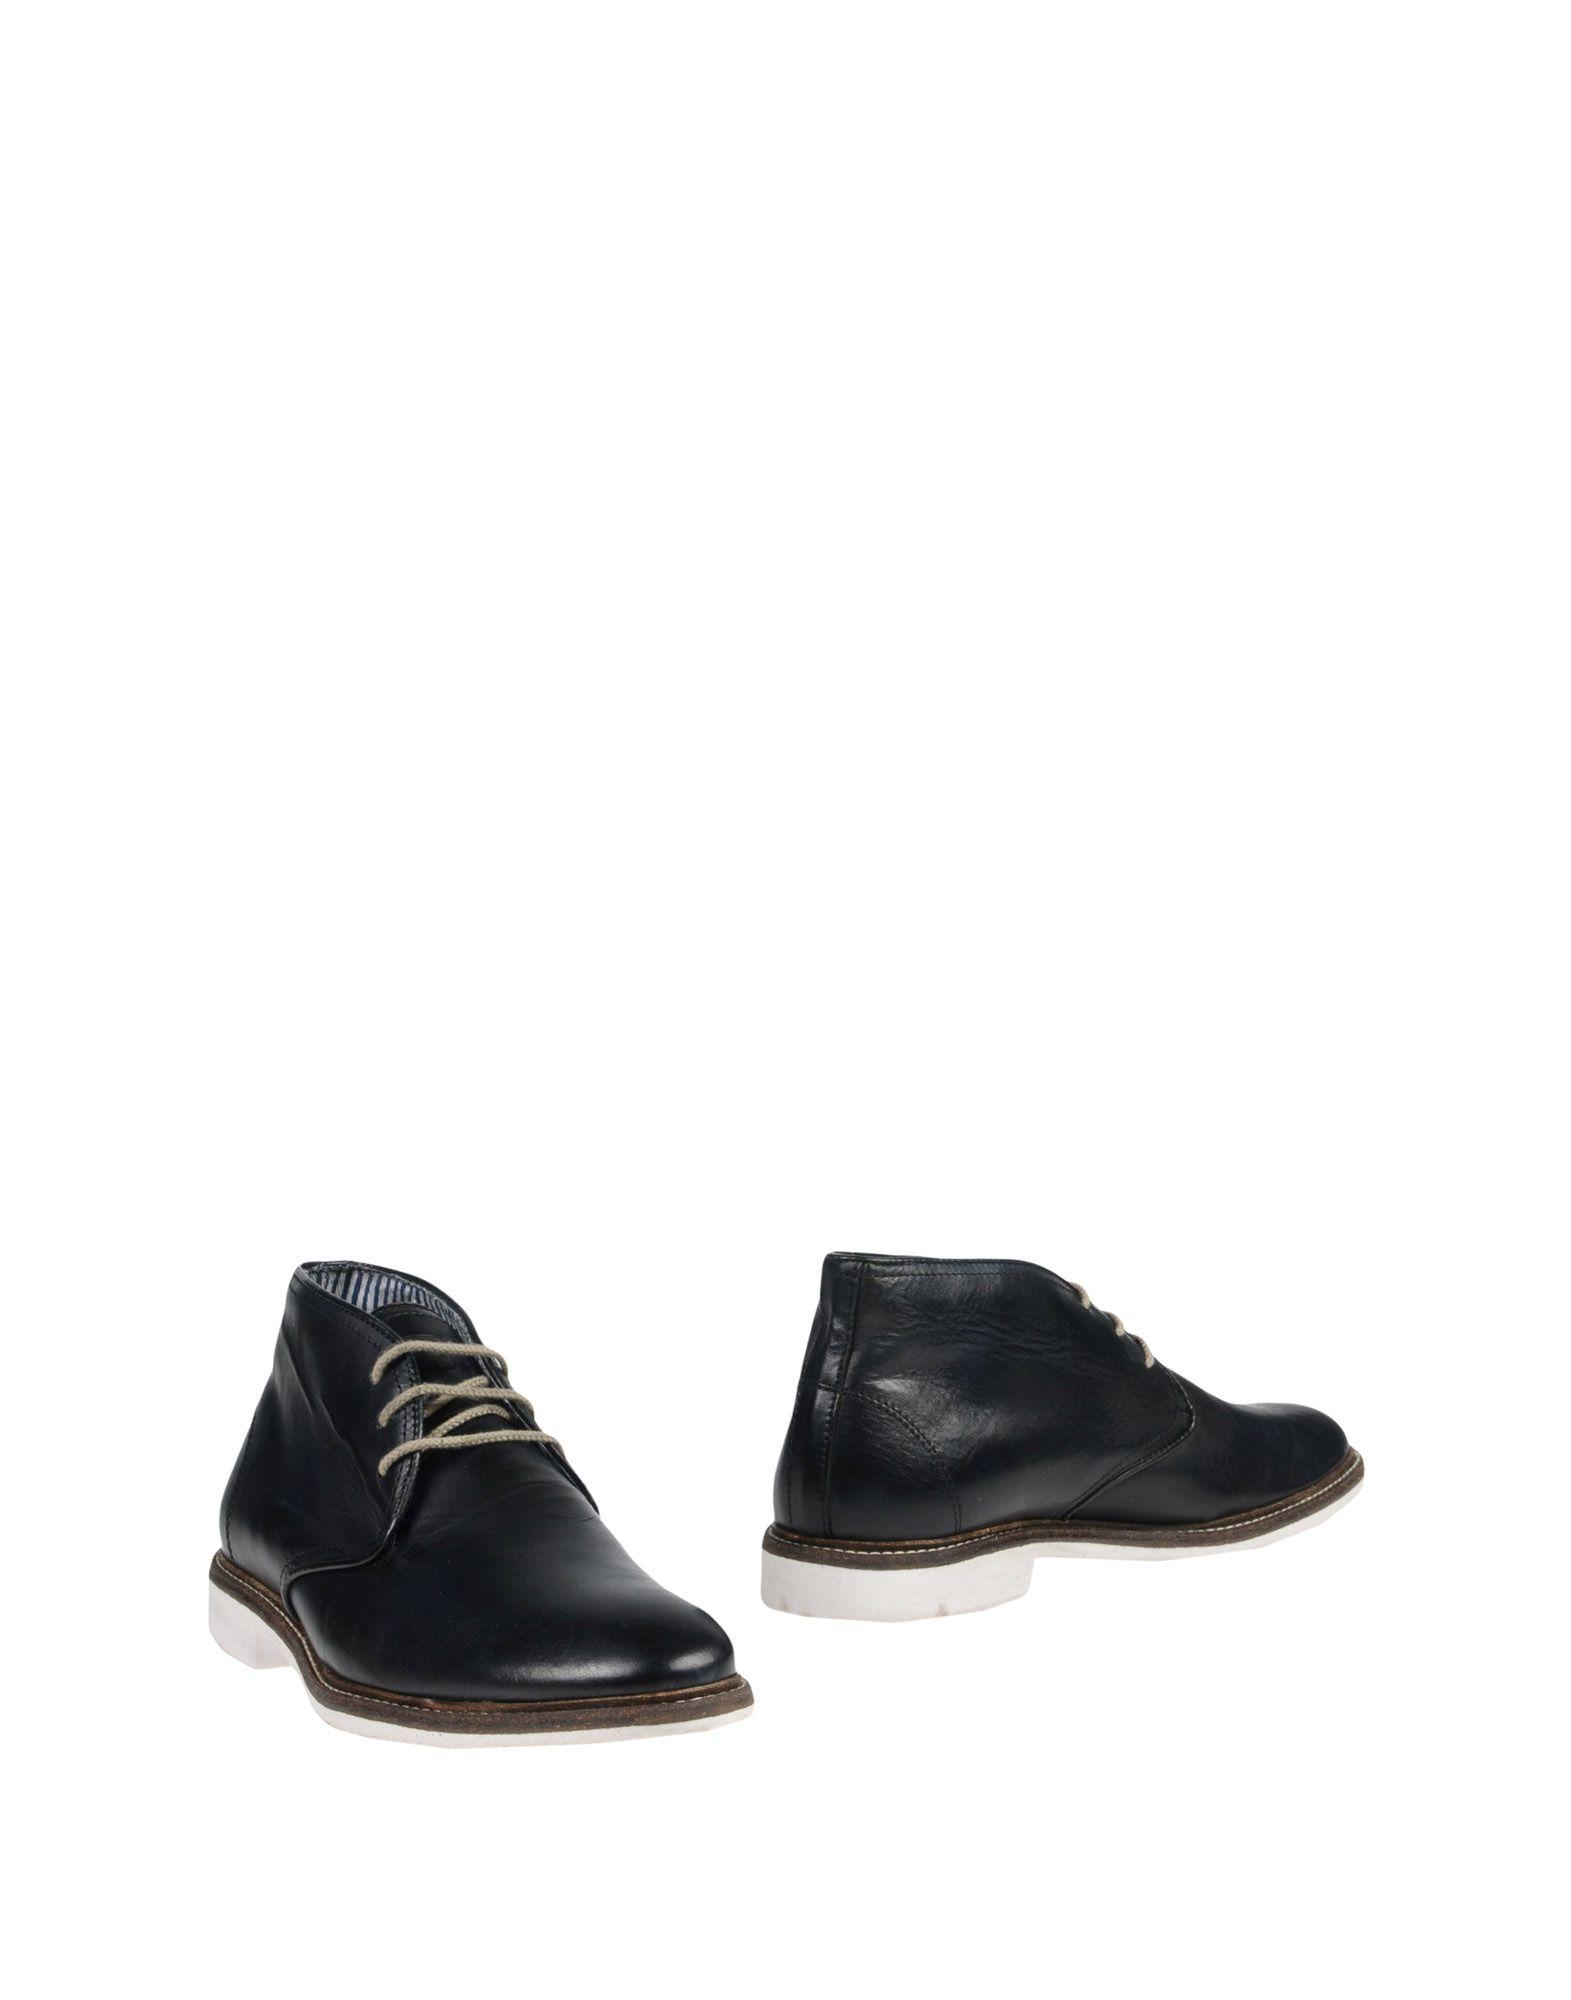 ALEXANDER TREND Полусапоги и высокие ботинки baldinini trend полусапоги и высокие ботинки